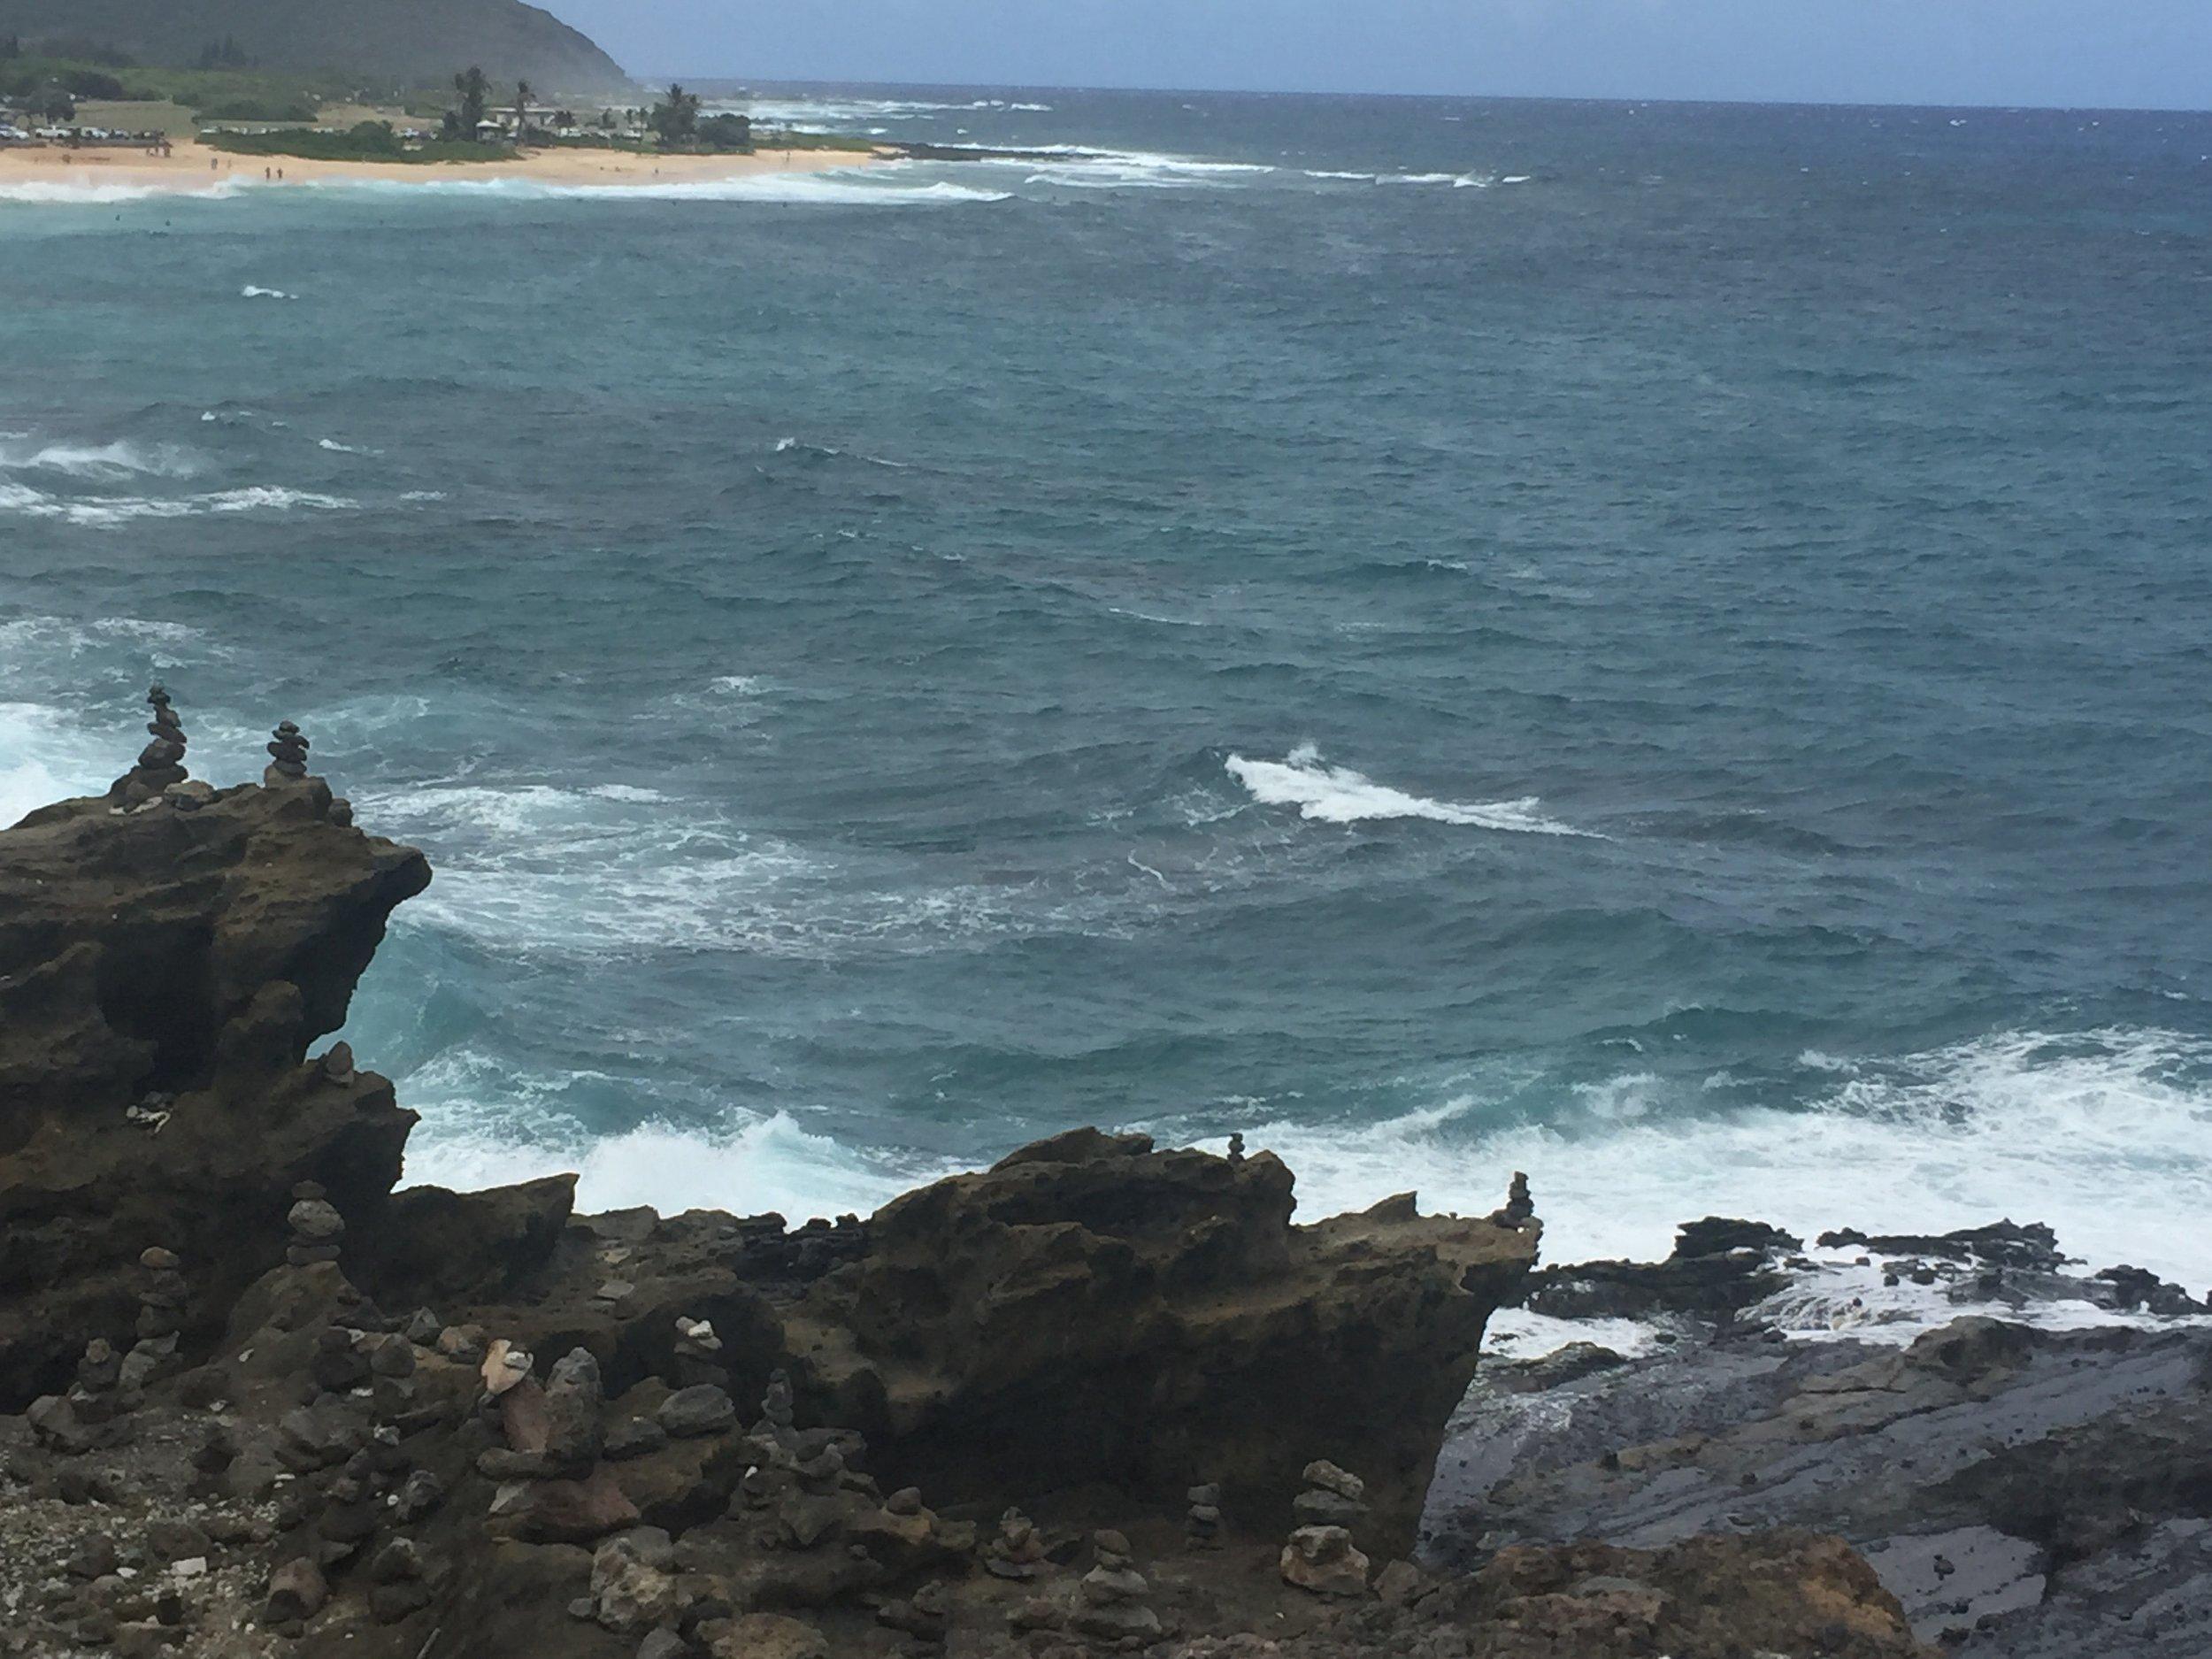 """Ahu""  - Oahu, Hawaii, July 2019"